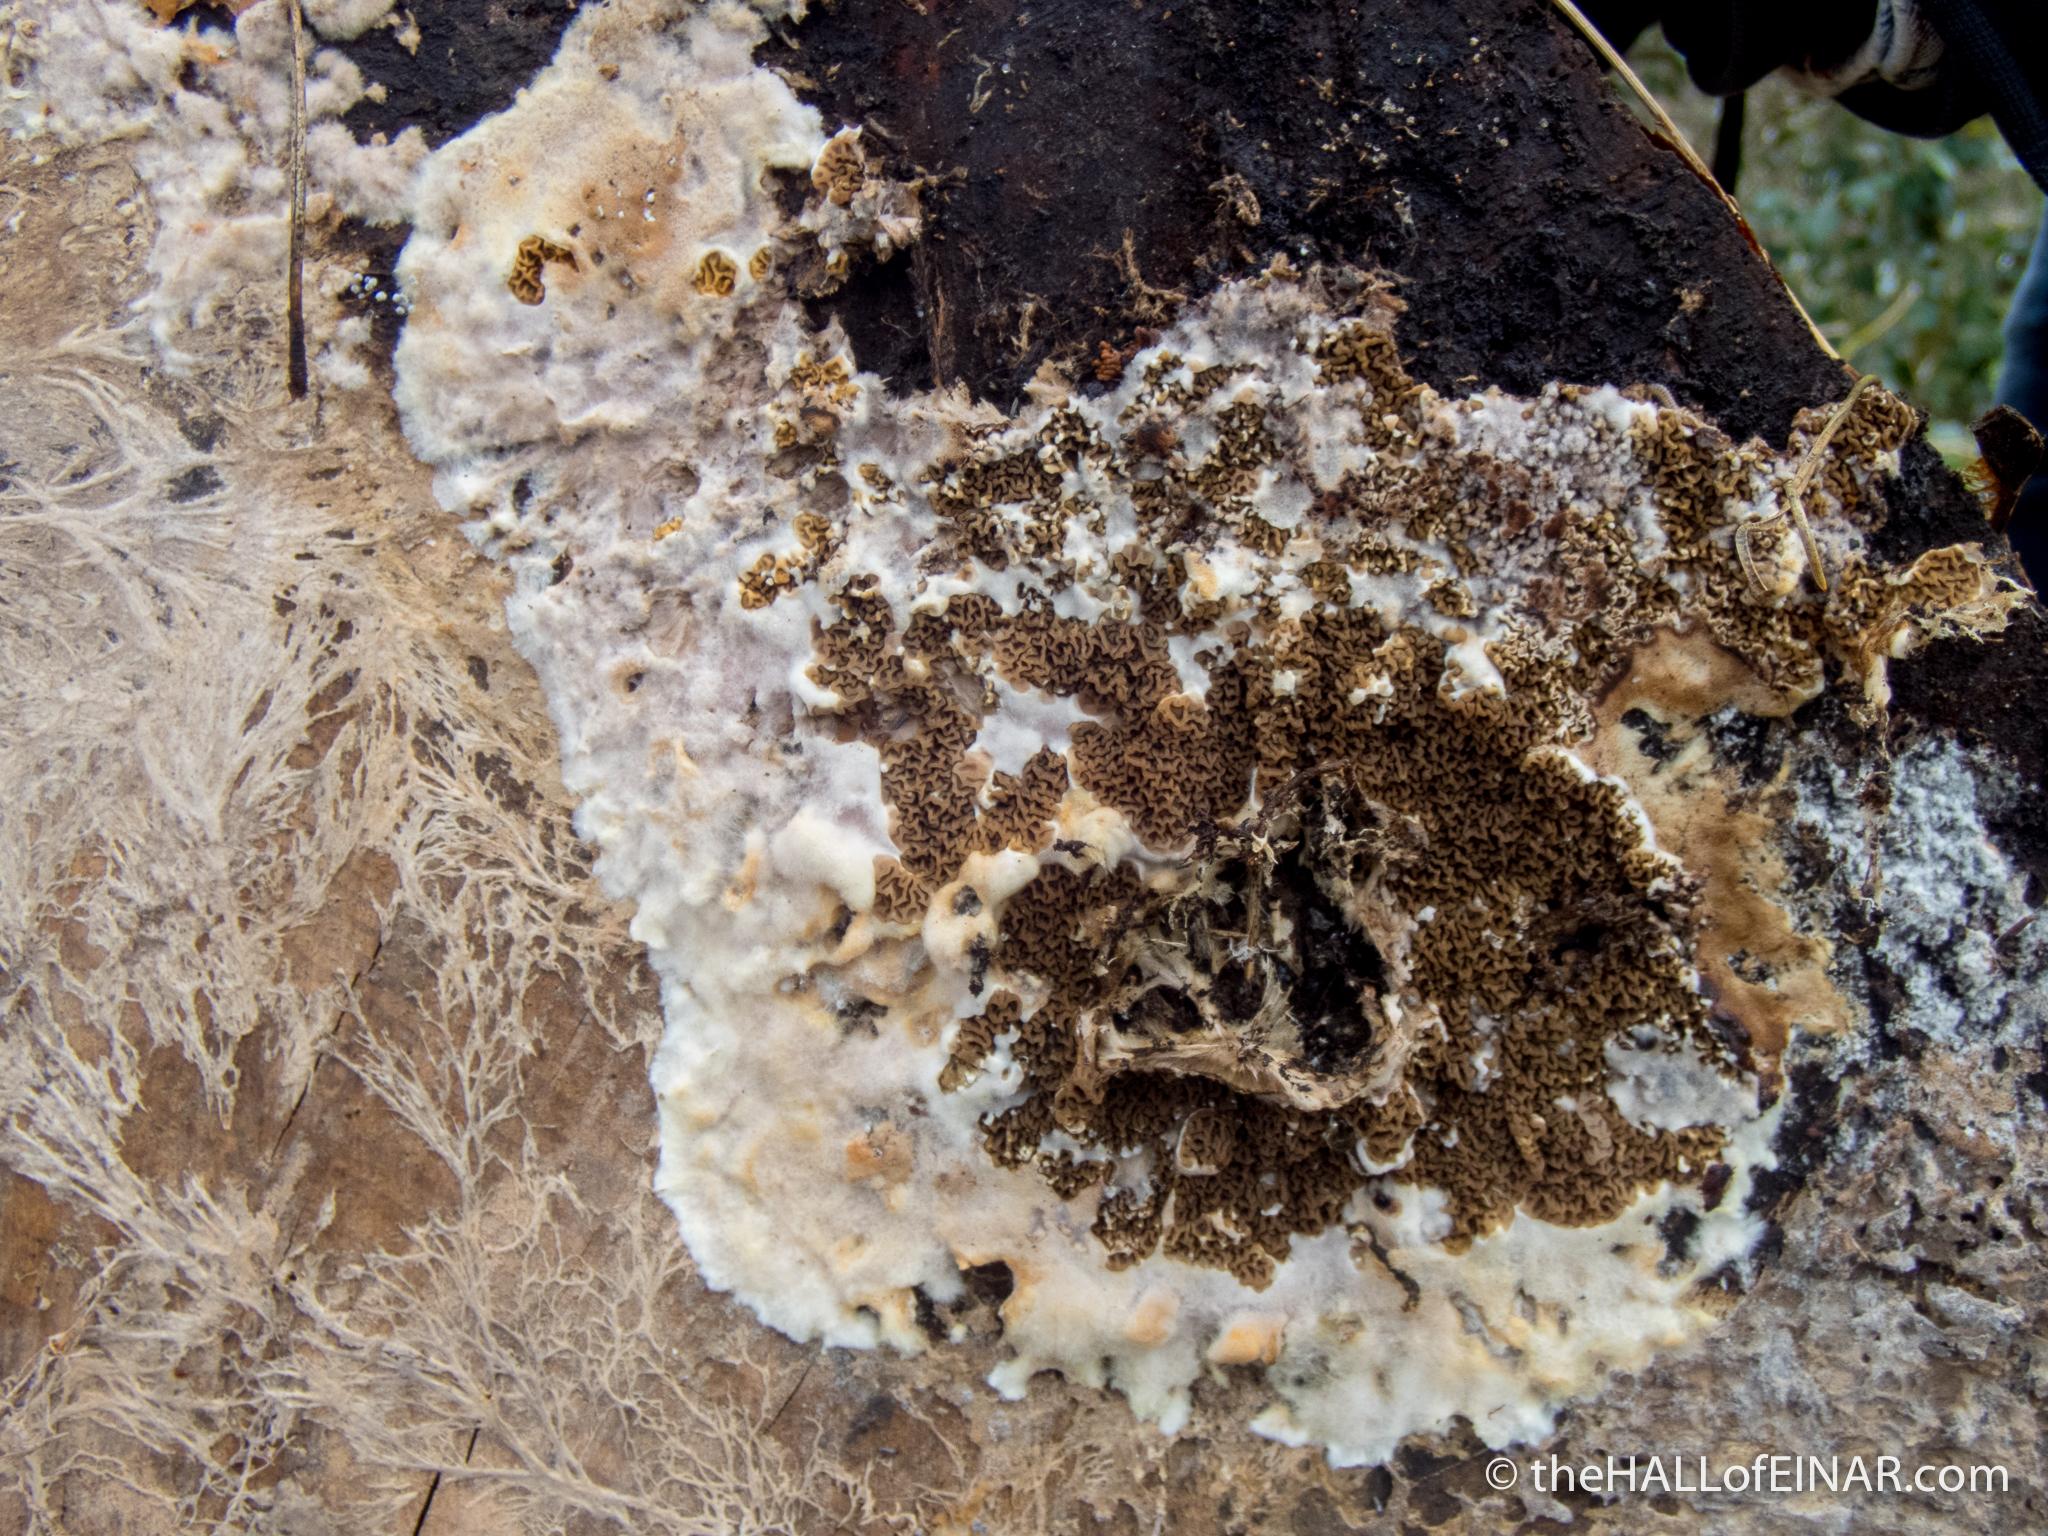 Serpula himantiodes - the Hall of Einar - photograph (c) David Bailey (not the)